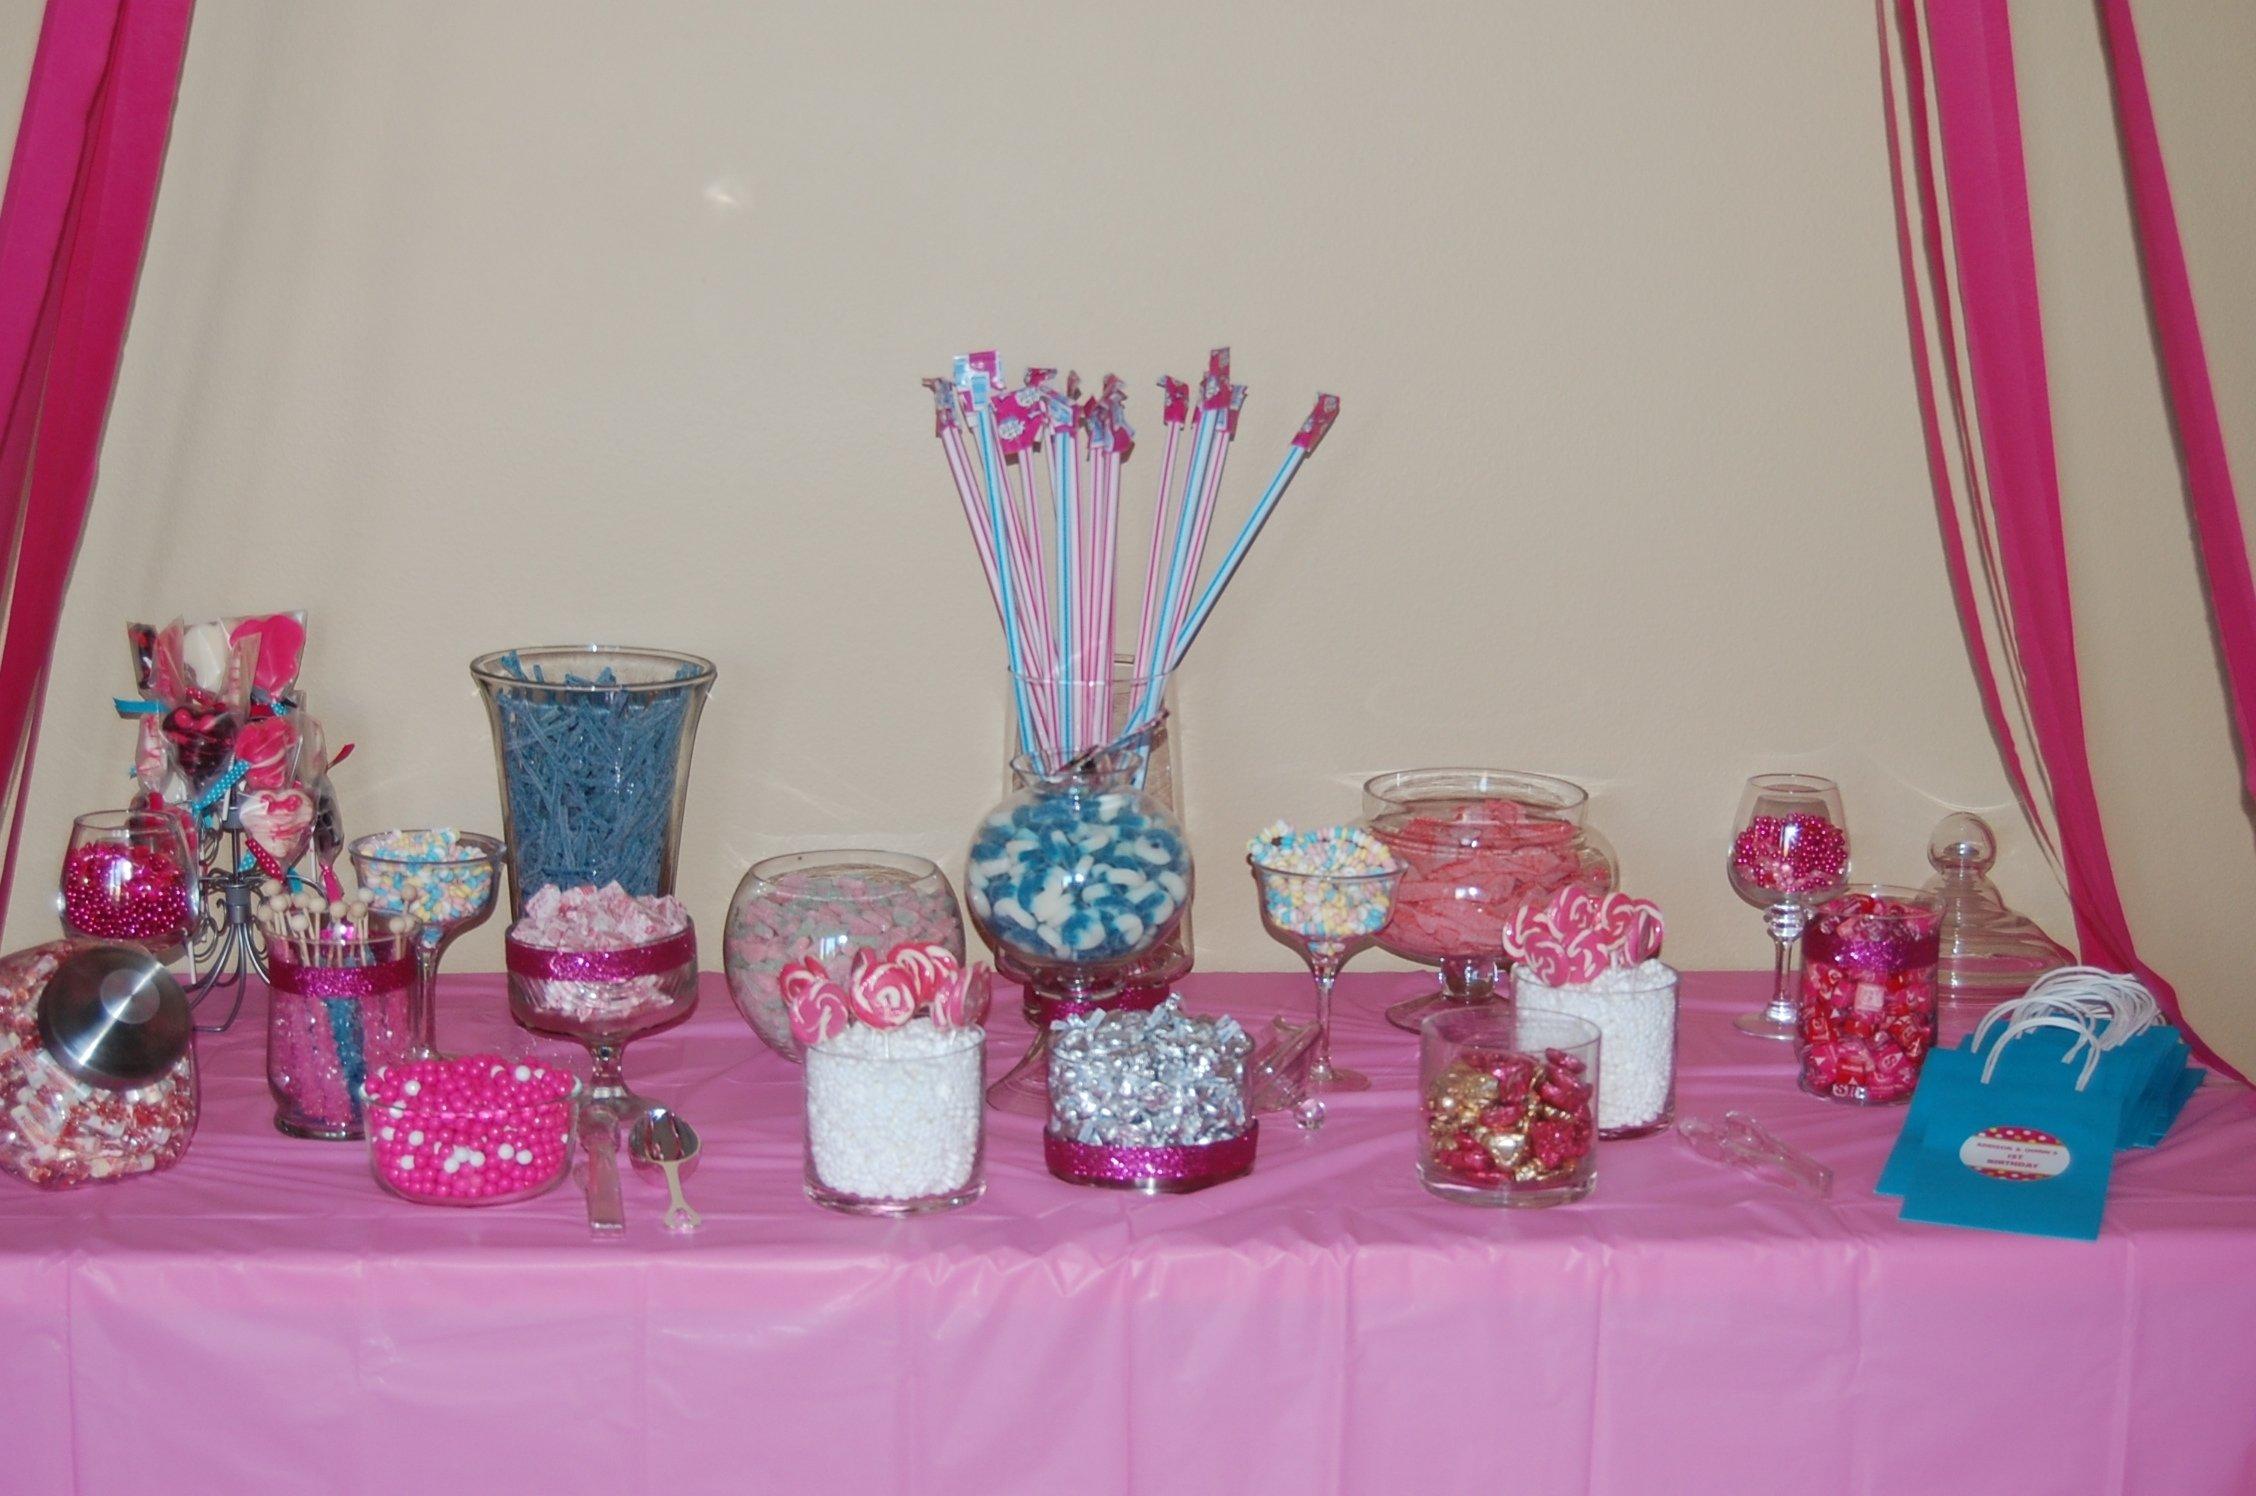 10 Wonderful Minnie Mouse Candy Bar Ideas minnie mouse birthday party savy momma 2021